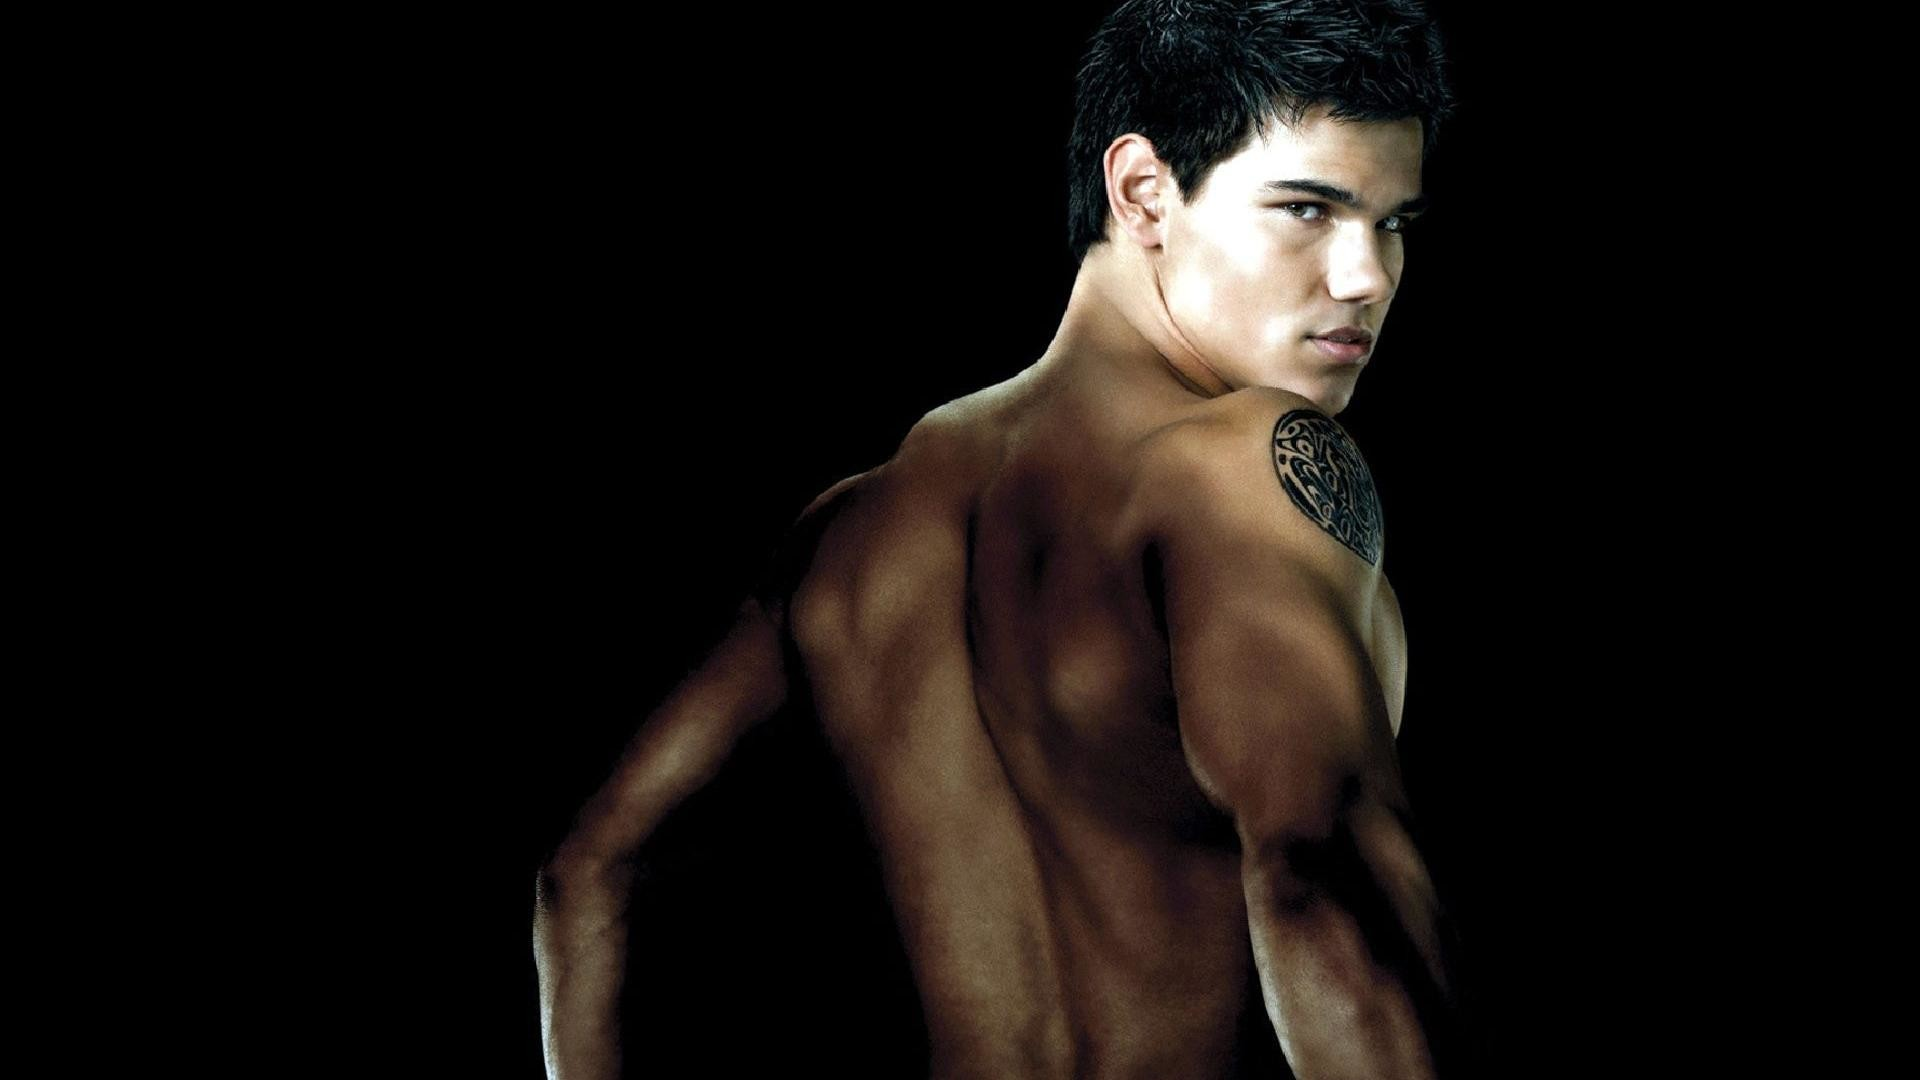 Taylor Lautner Shirtless Wallpaper Desktop Images & Pictures – Becuo